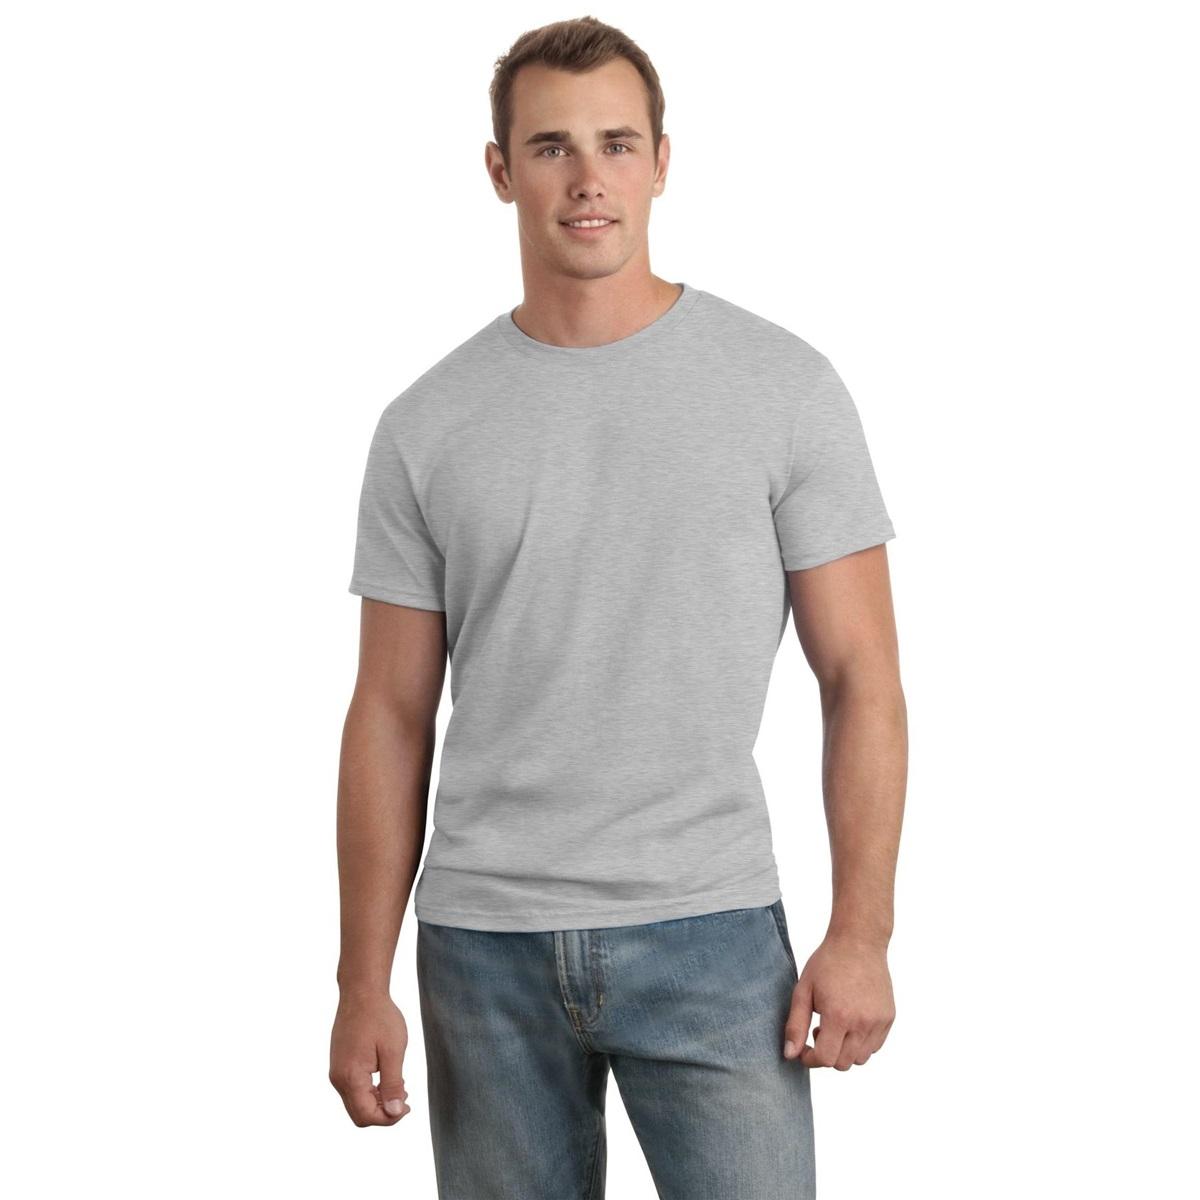 Hanes 4980 Nano T Cotton T Shirt Light Steel